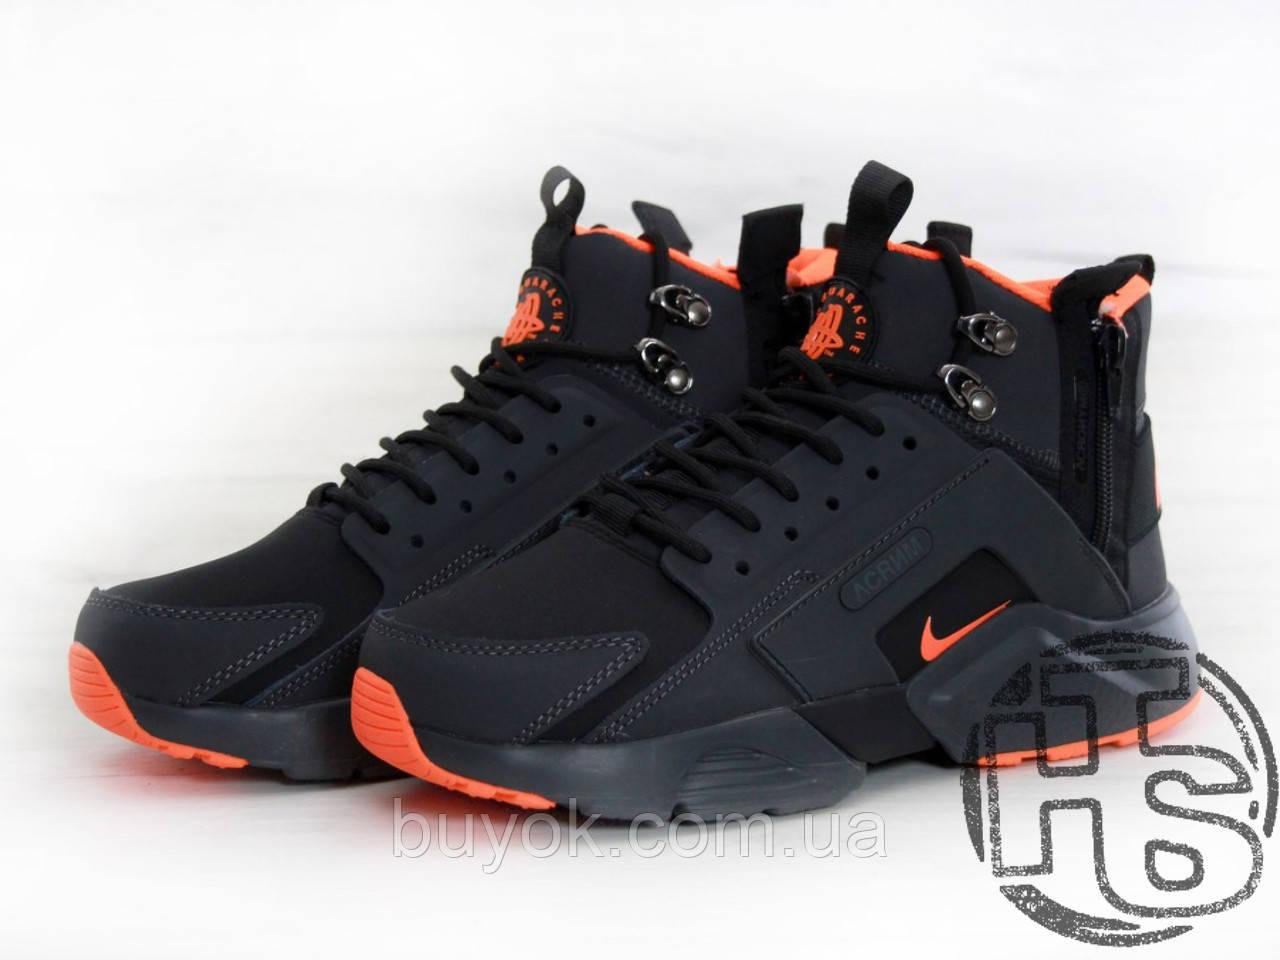 Мужские кроссовки Nike Air Huarache x ACRONYM City MID LEA Black/Orange 856787-107